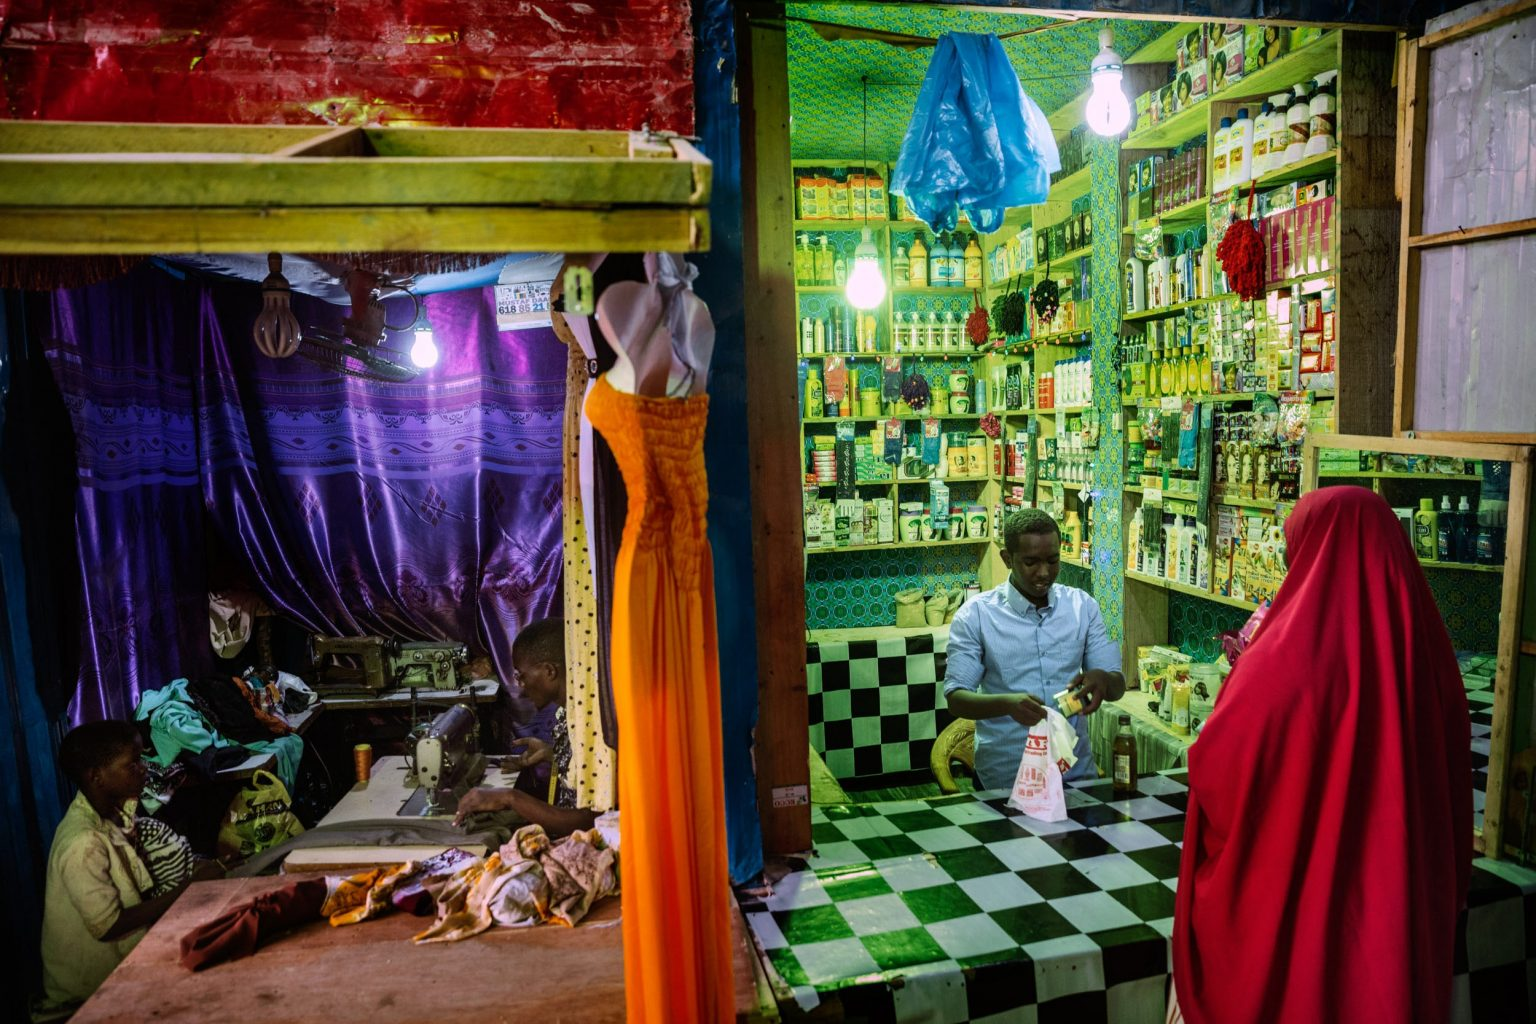 Africa, Somalia, Benaadir region. Mogadishu. 16/09/2017. Medina Market, in the Wadajir district. Halane's shop belongs to youth entrepreneurship group's shops program, trained and support by concern in BRCiS's consortium program.